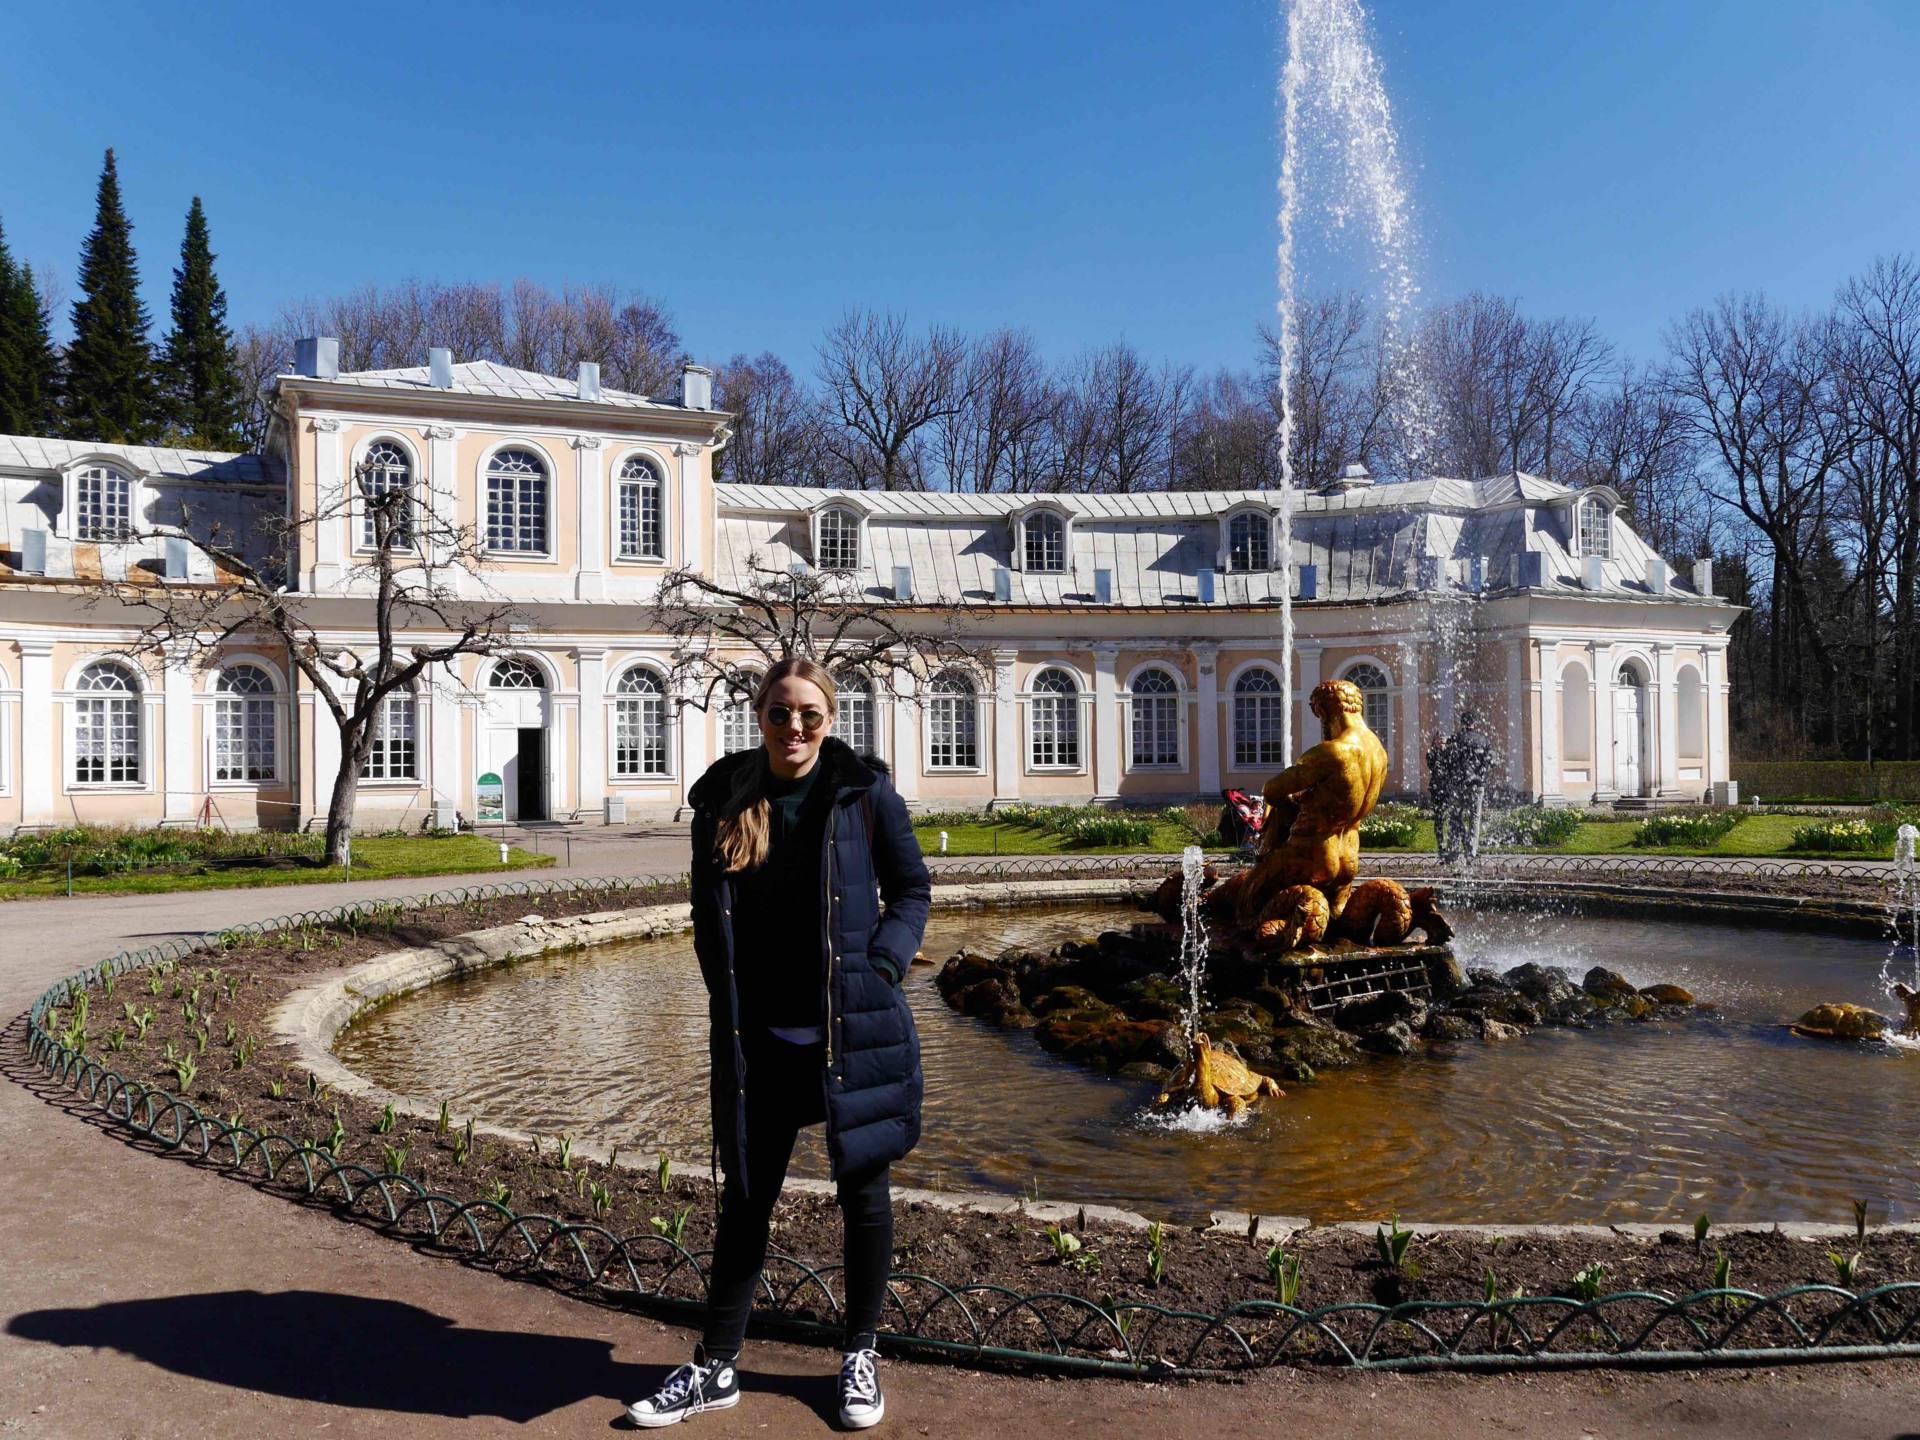 Things to do in St Petersburg | Peterhof Palace Gardens